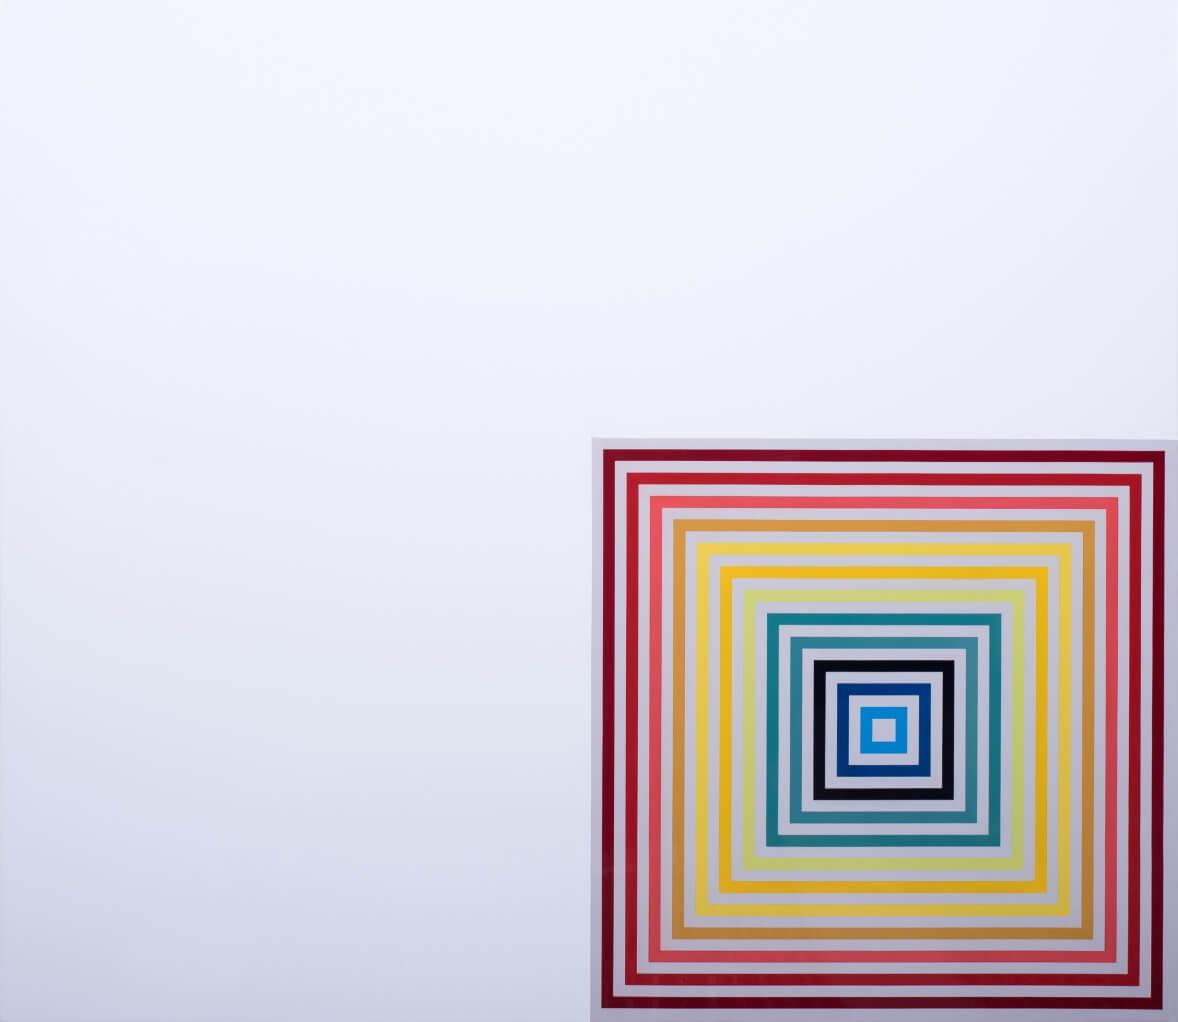 A Photo of an artwork